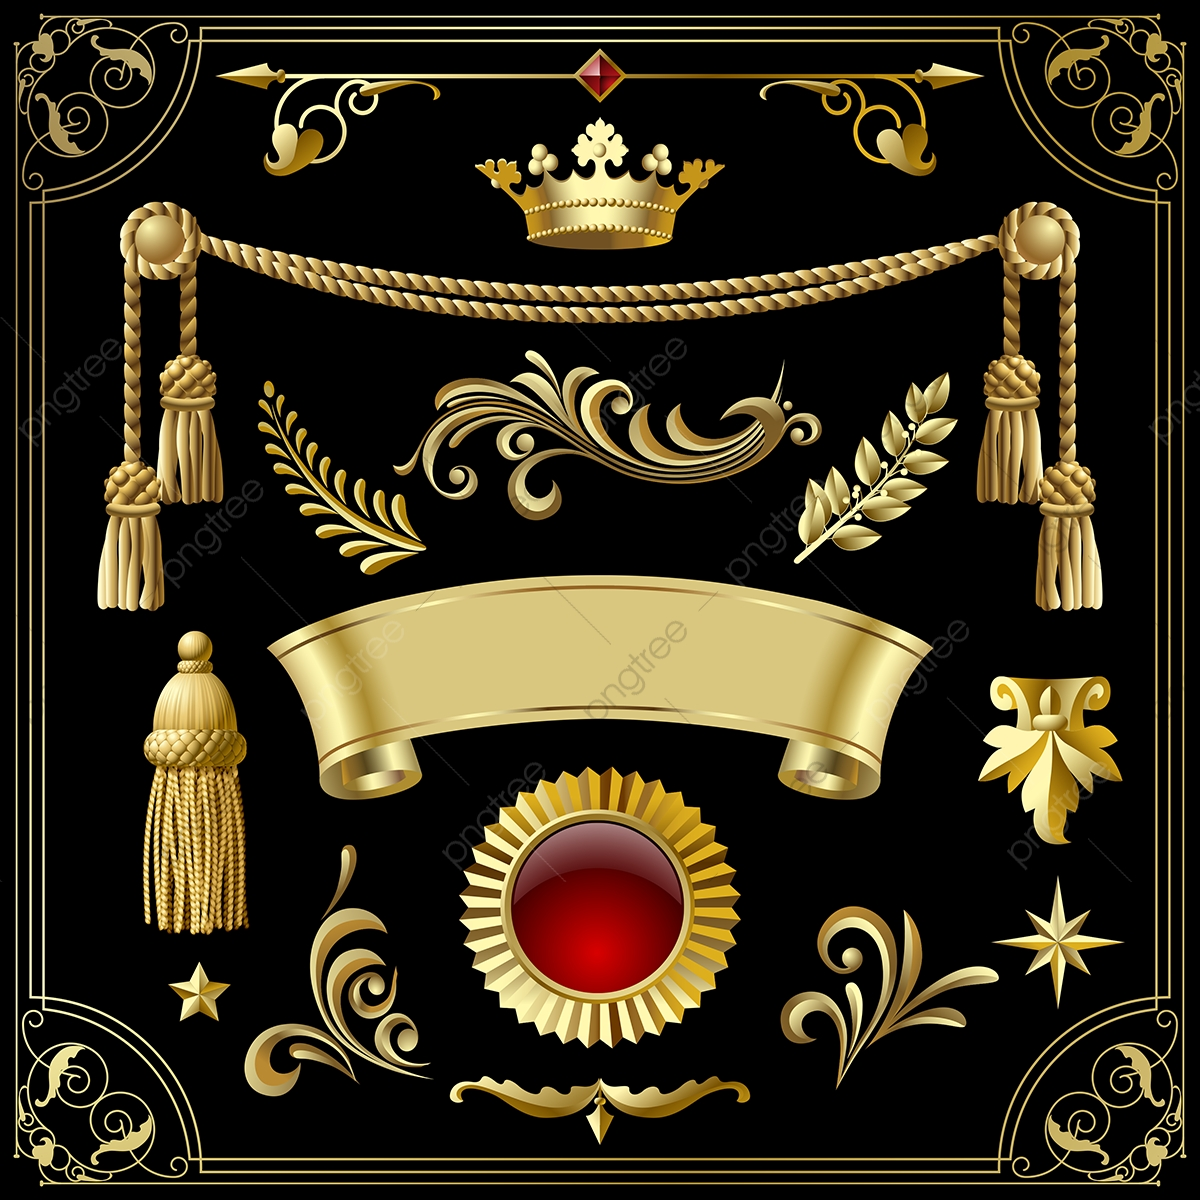 Adobe Illustrator Euclidean Vector Gold Ribbon Elegant, Crown